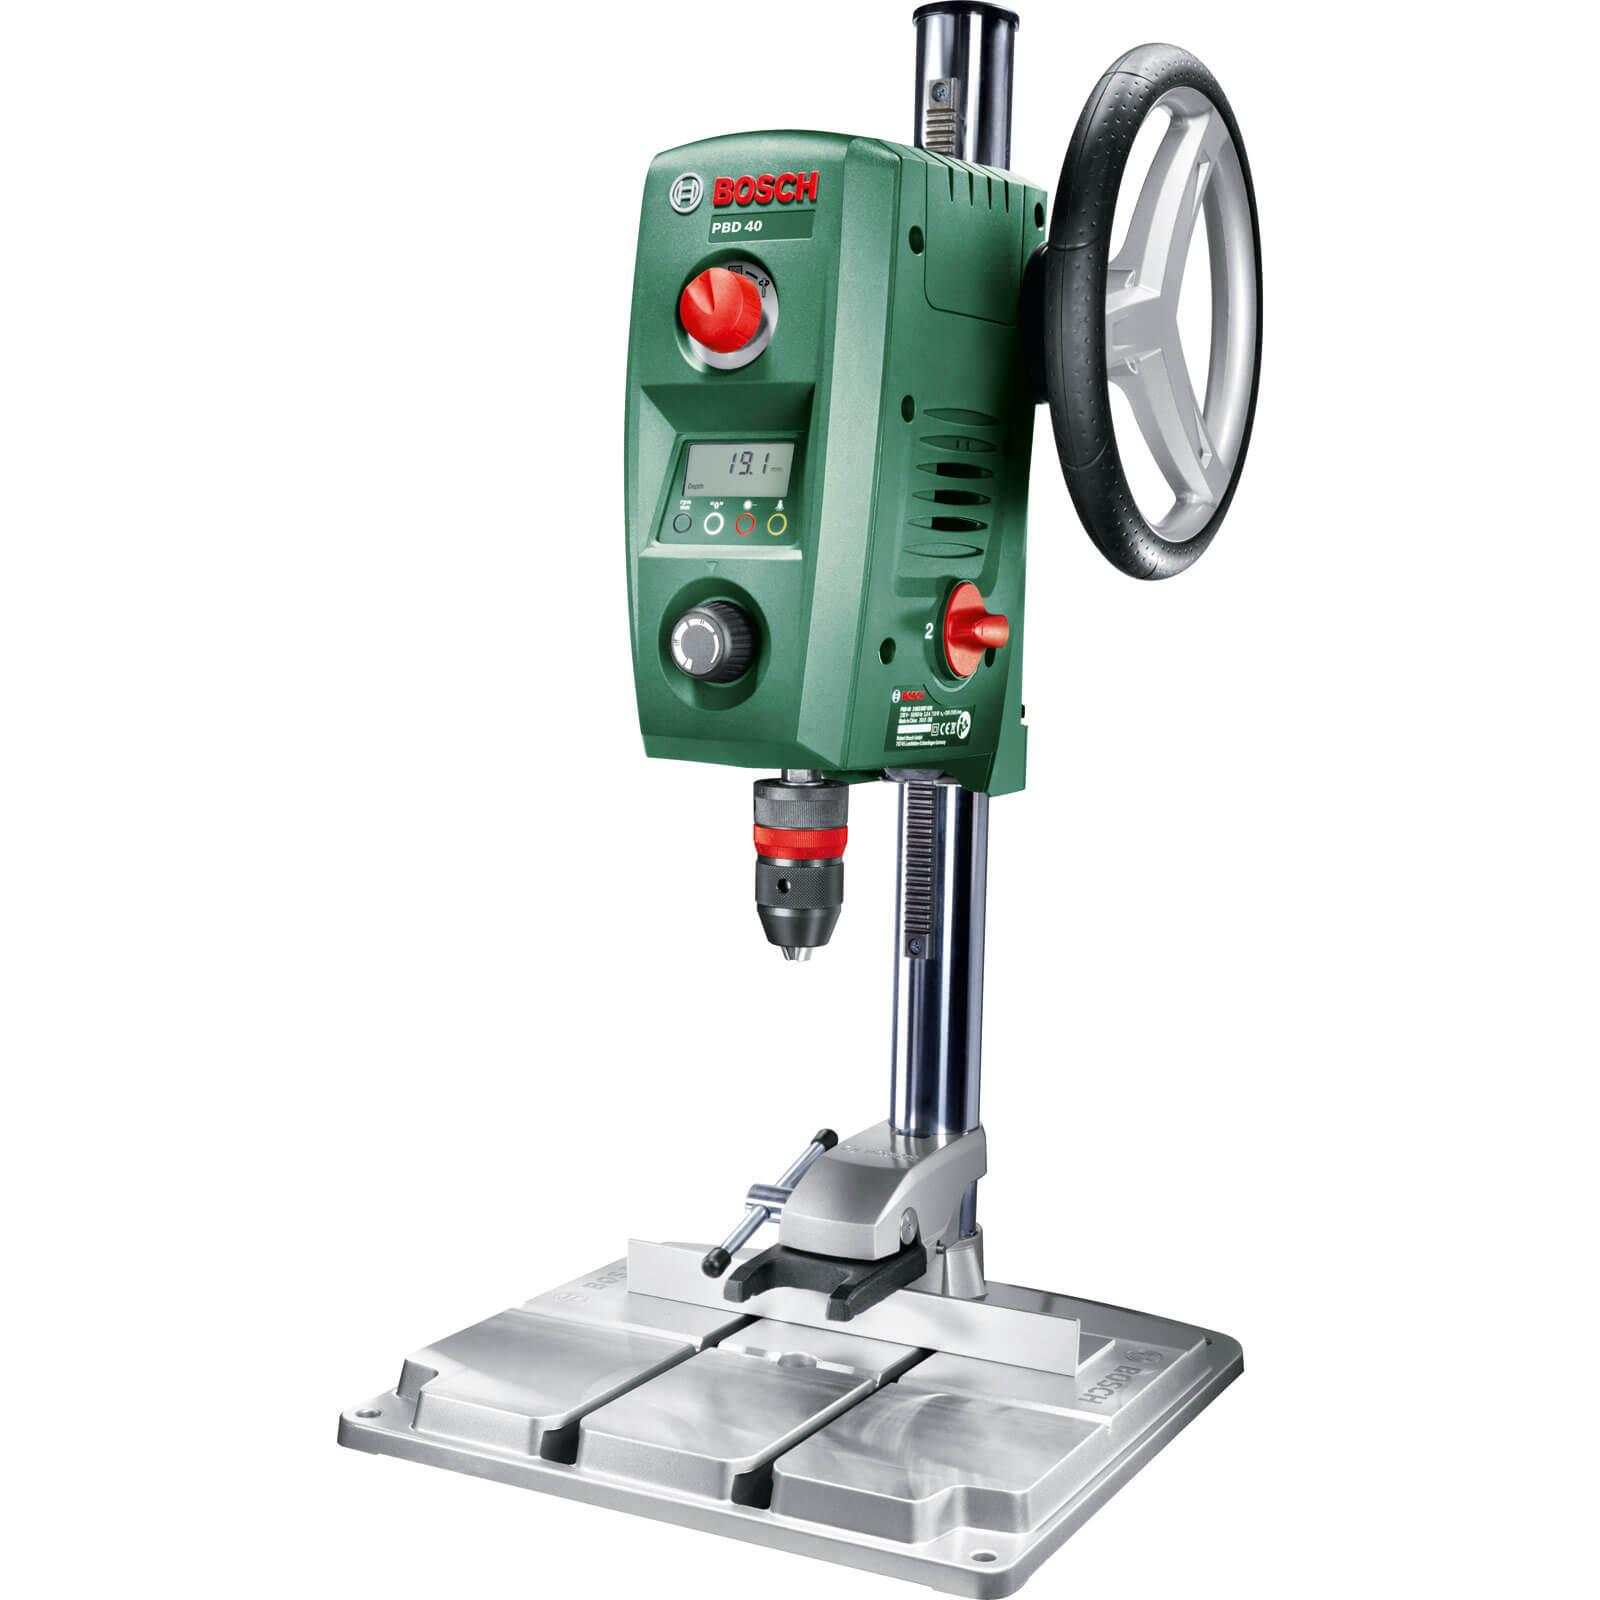 Bosch PBD 40 Workshop Bench Pillar Drill 240v